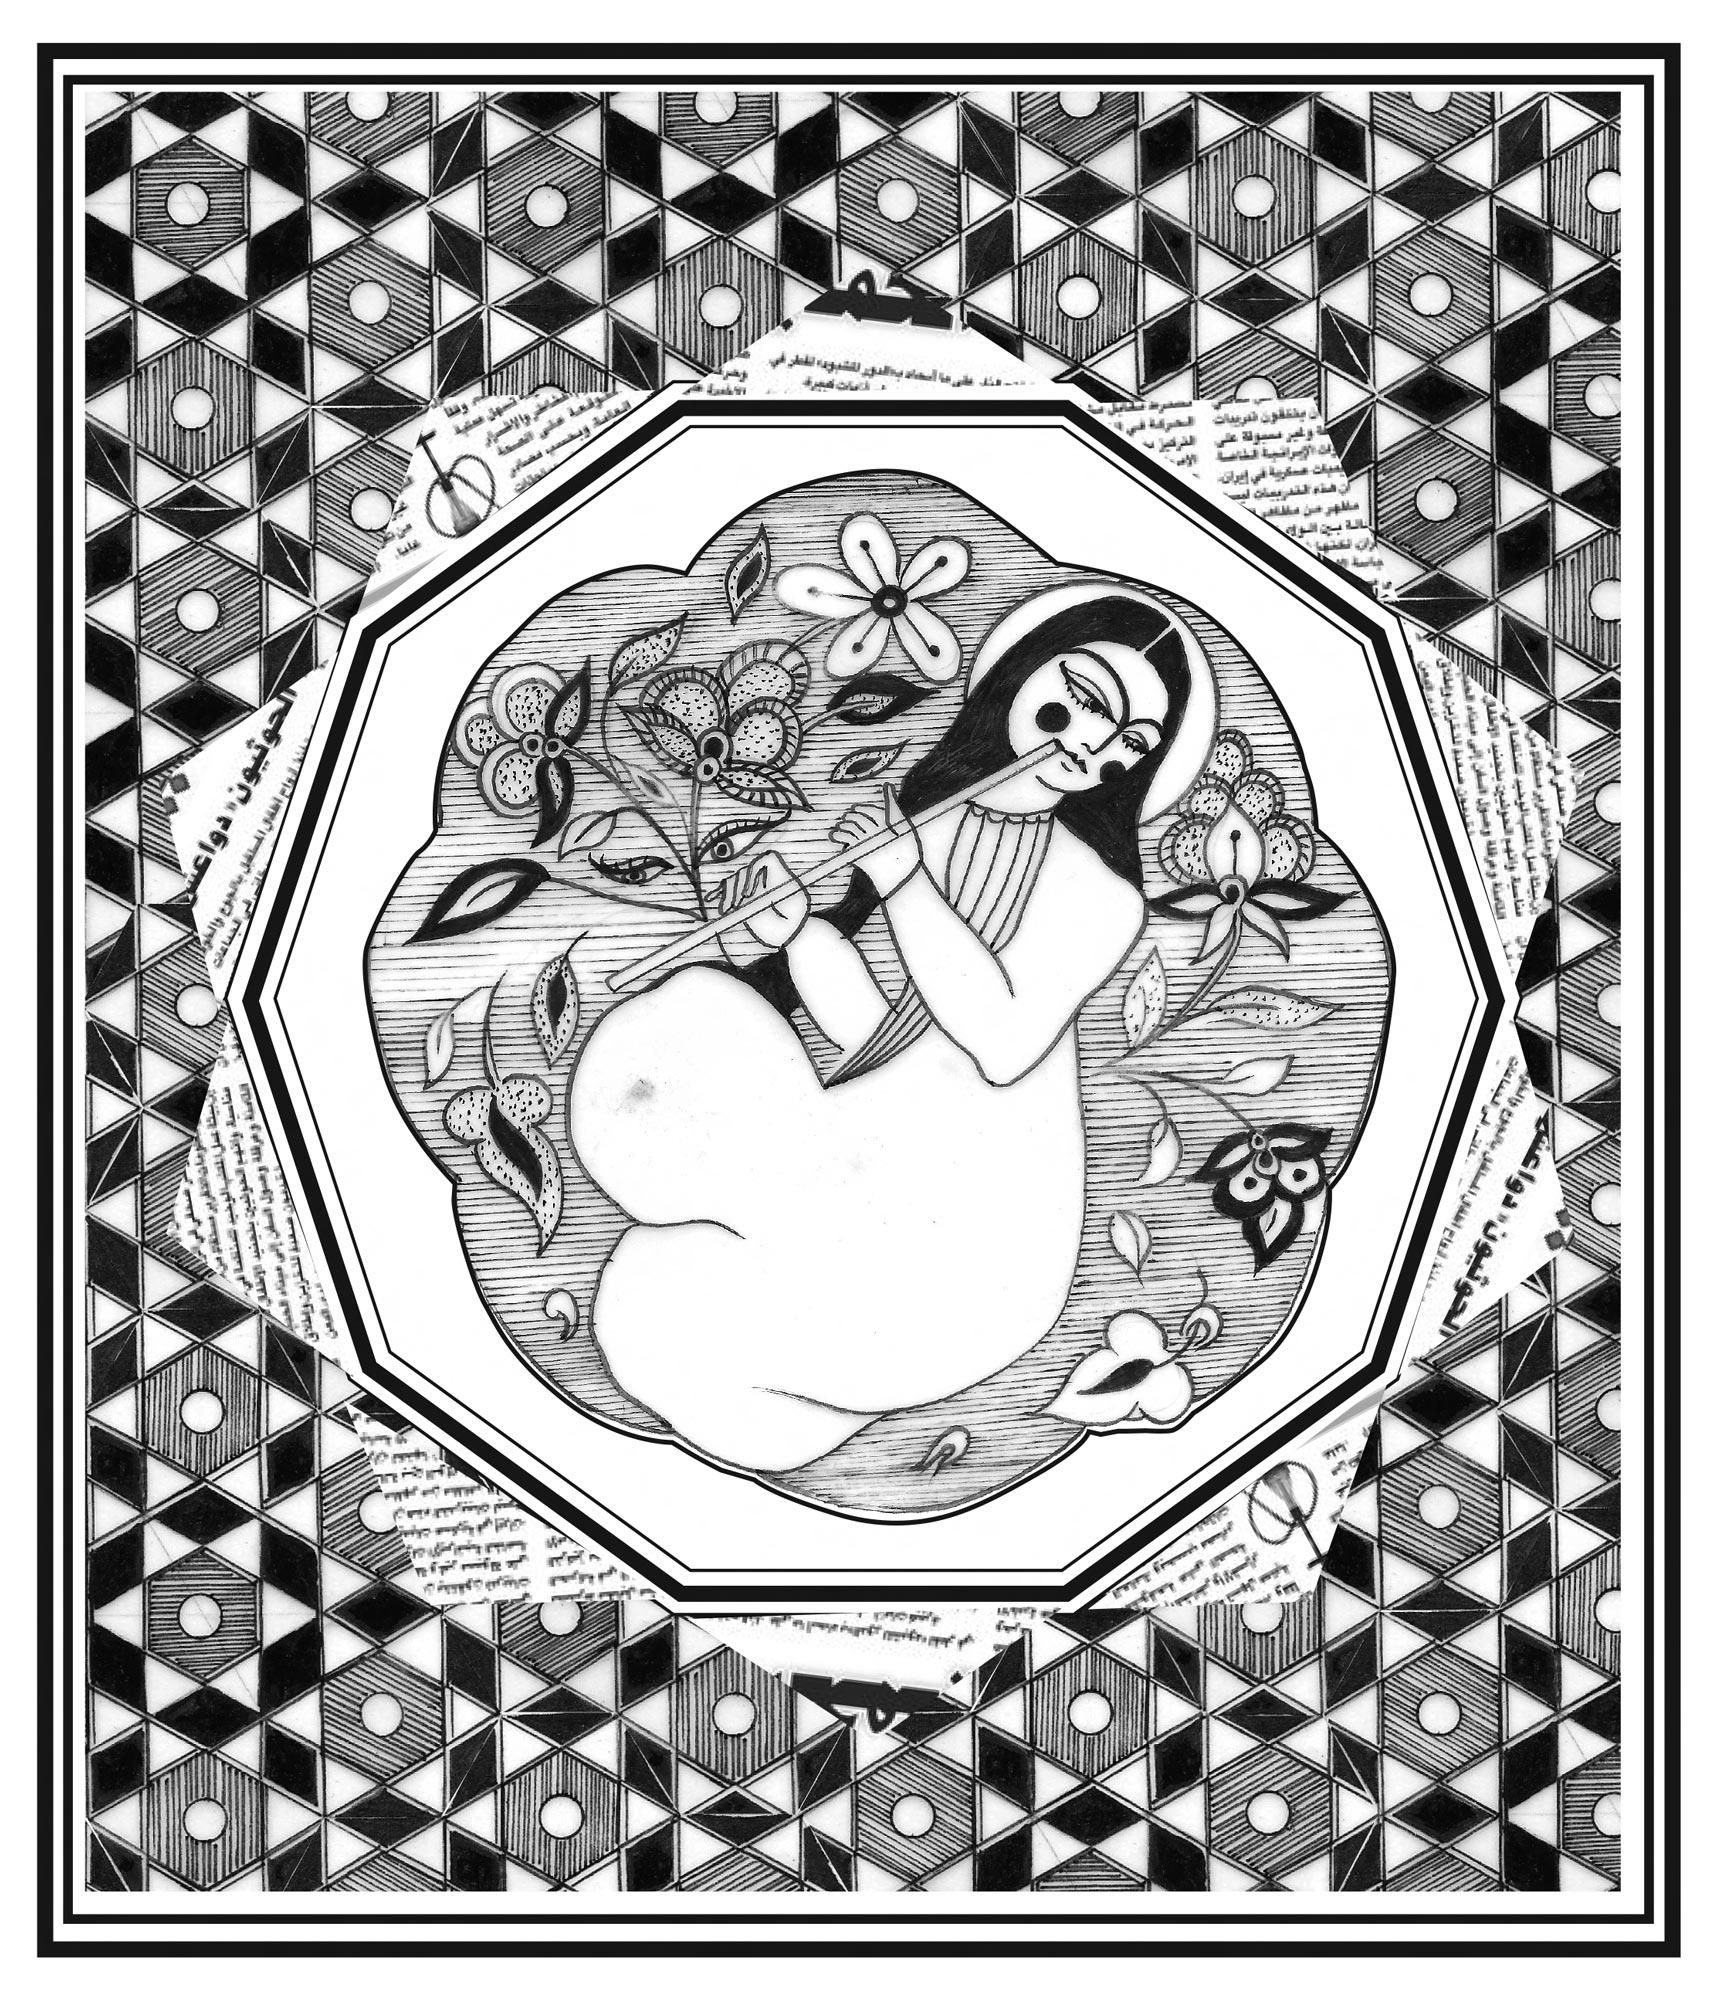 kol-yoghani-al-laylah-2018-lightbox-11.7x16.5-02.jpg